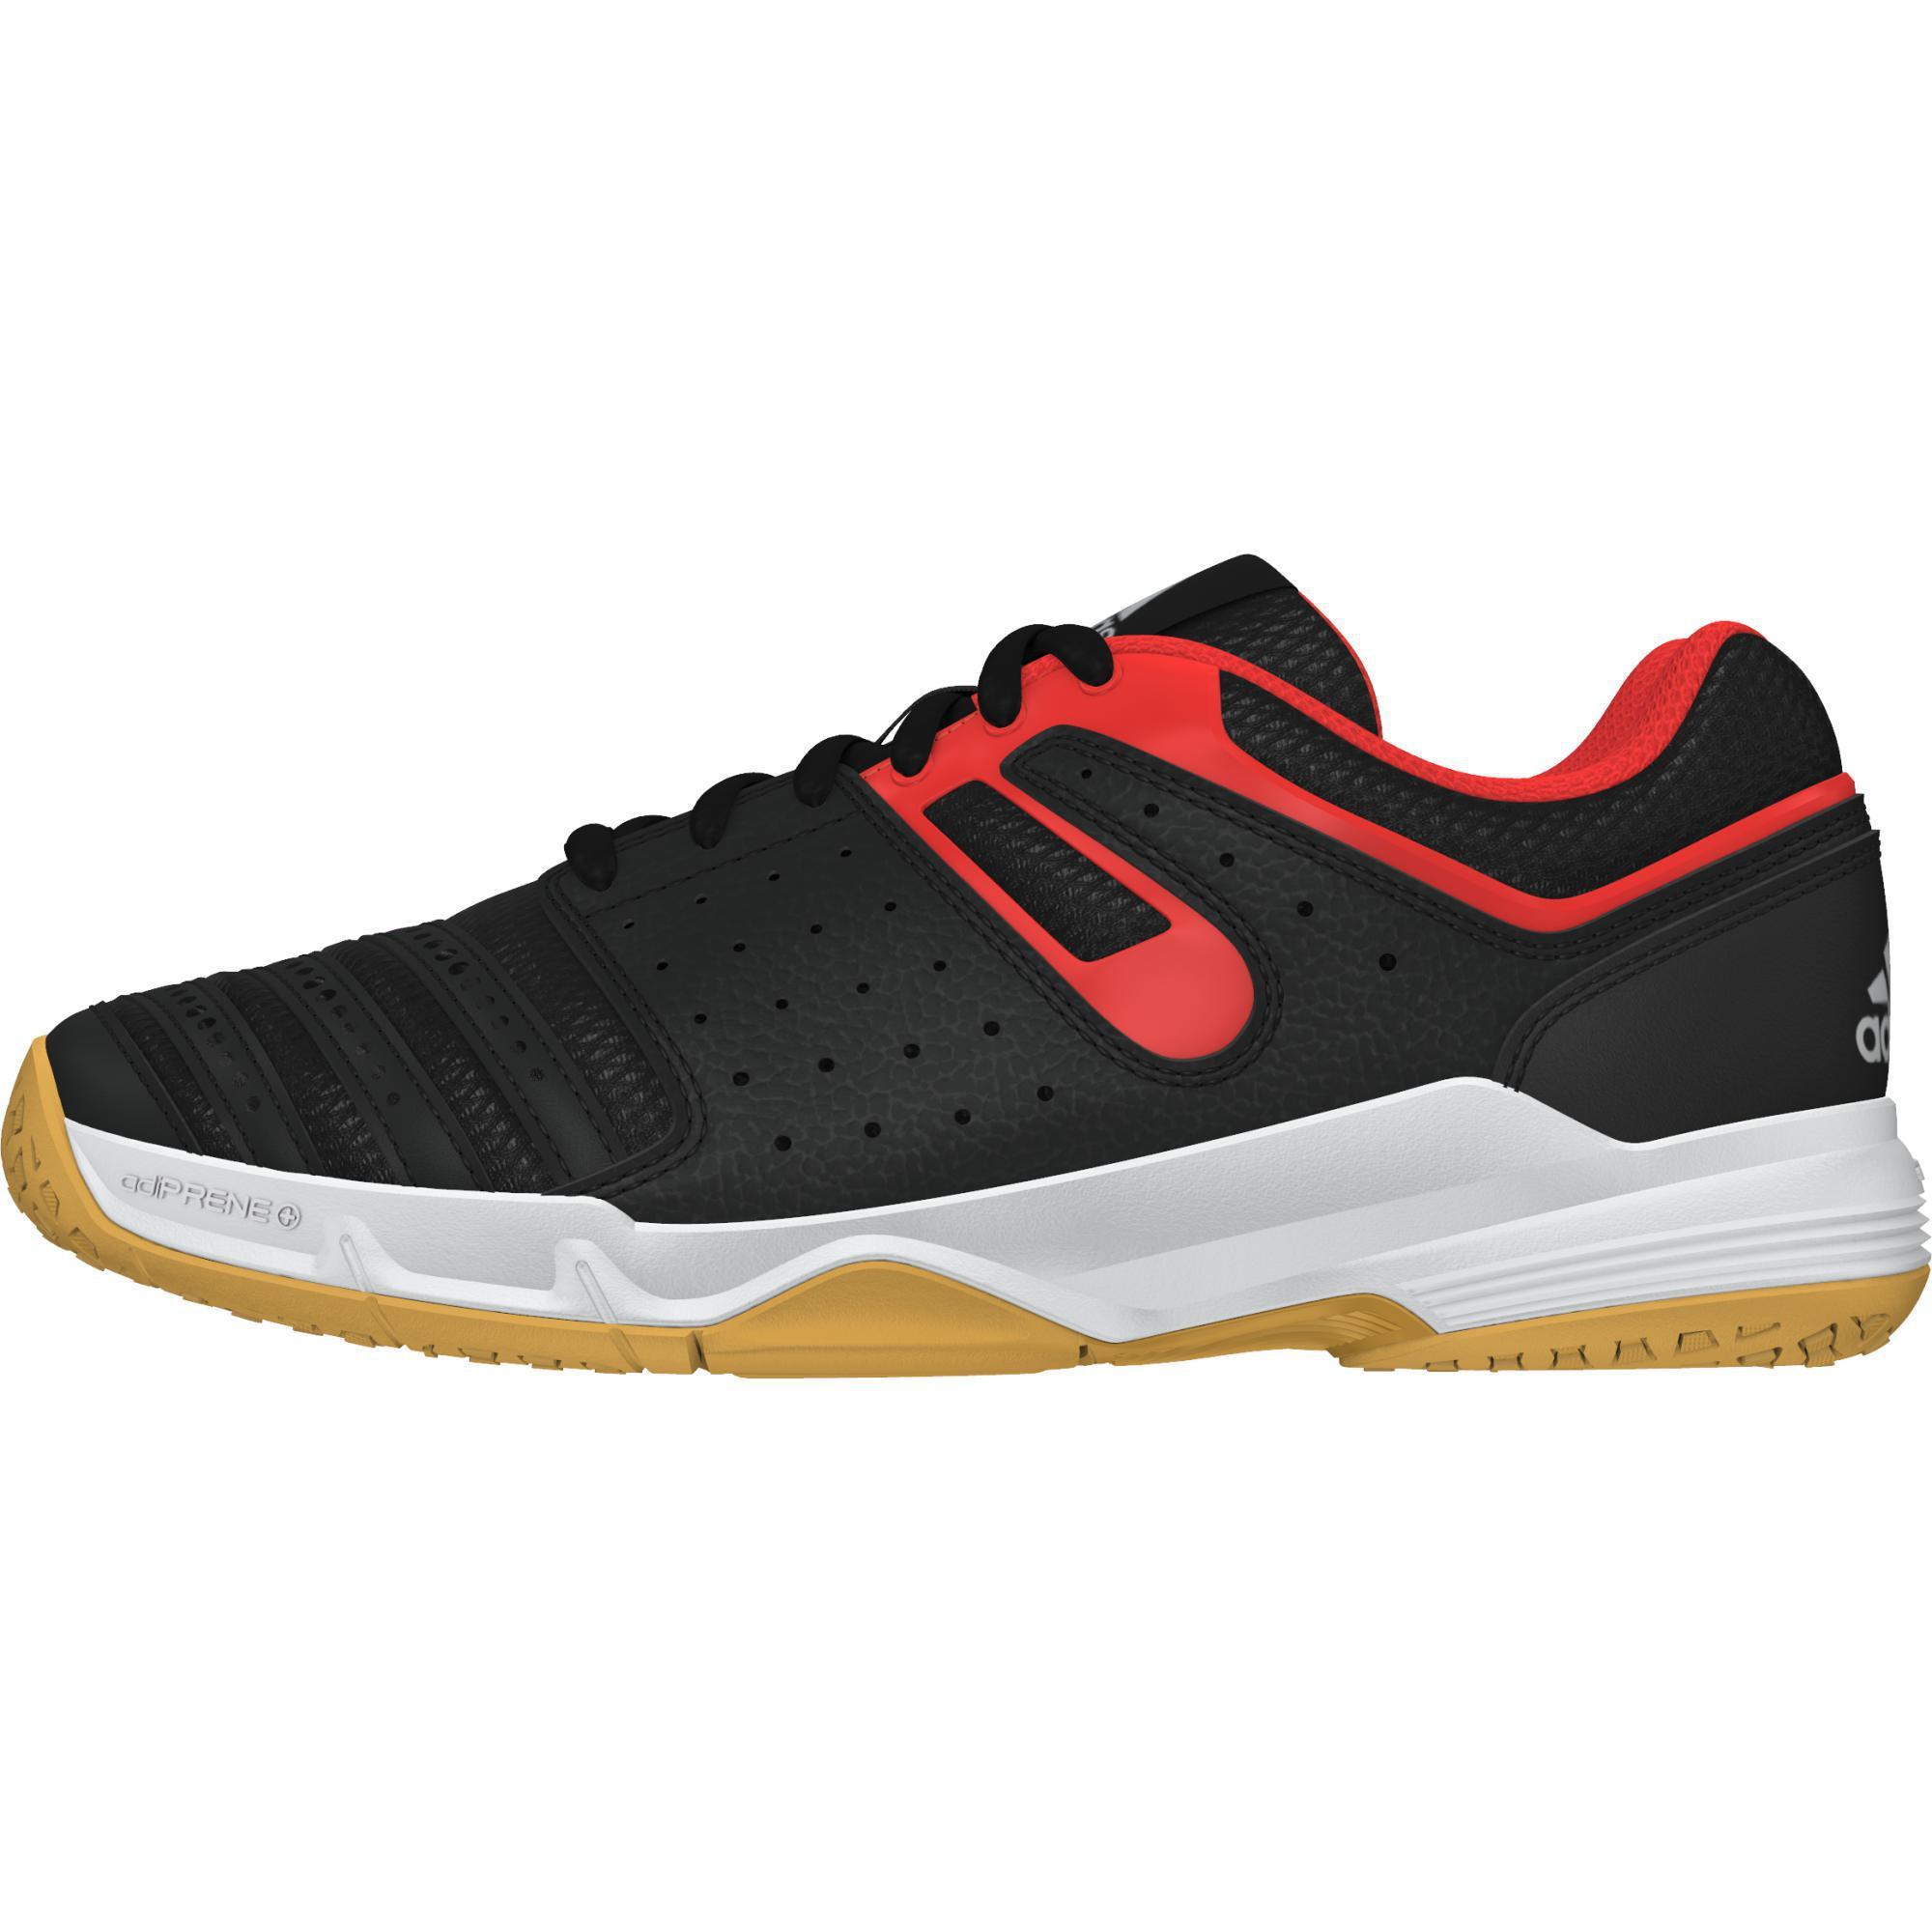 Adidas Boys Corte Neri Stabil Indoor Scarpe Neri Corte / Orange 5d2897